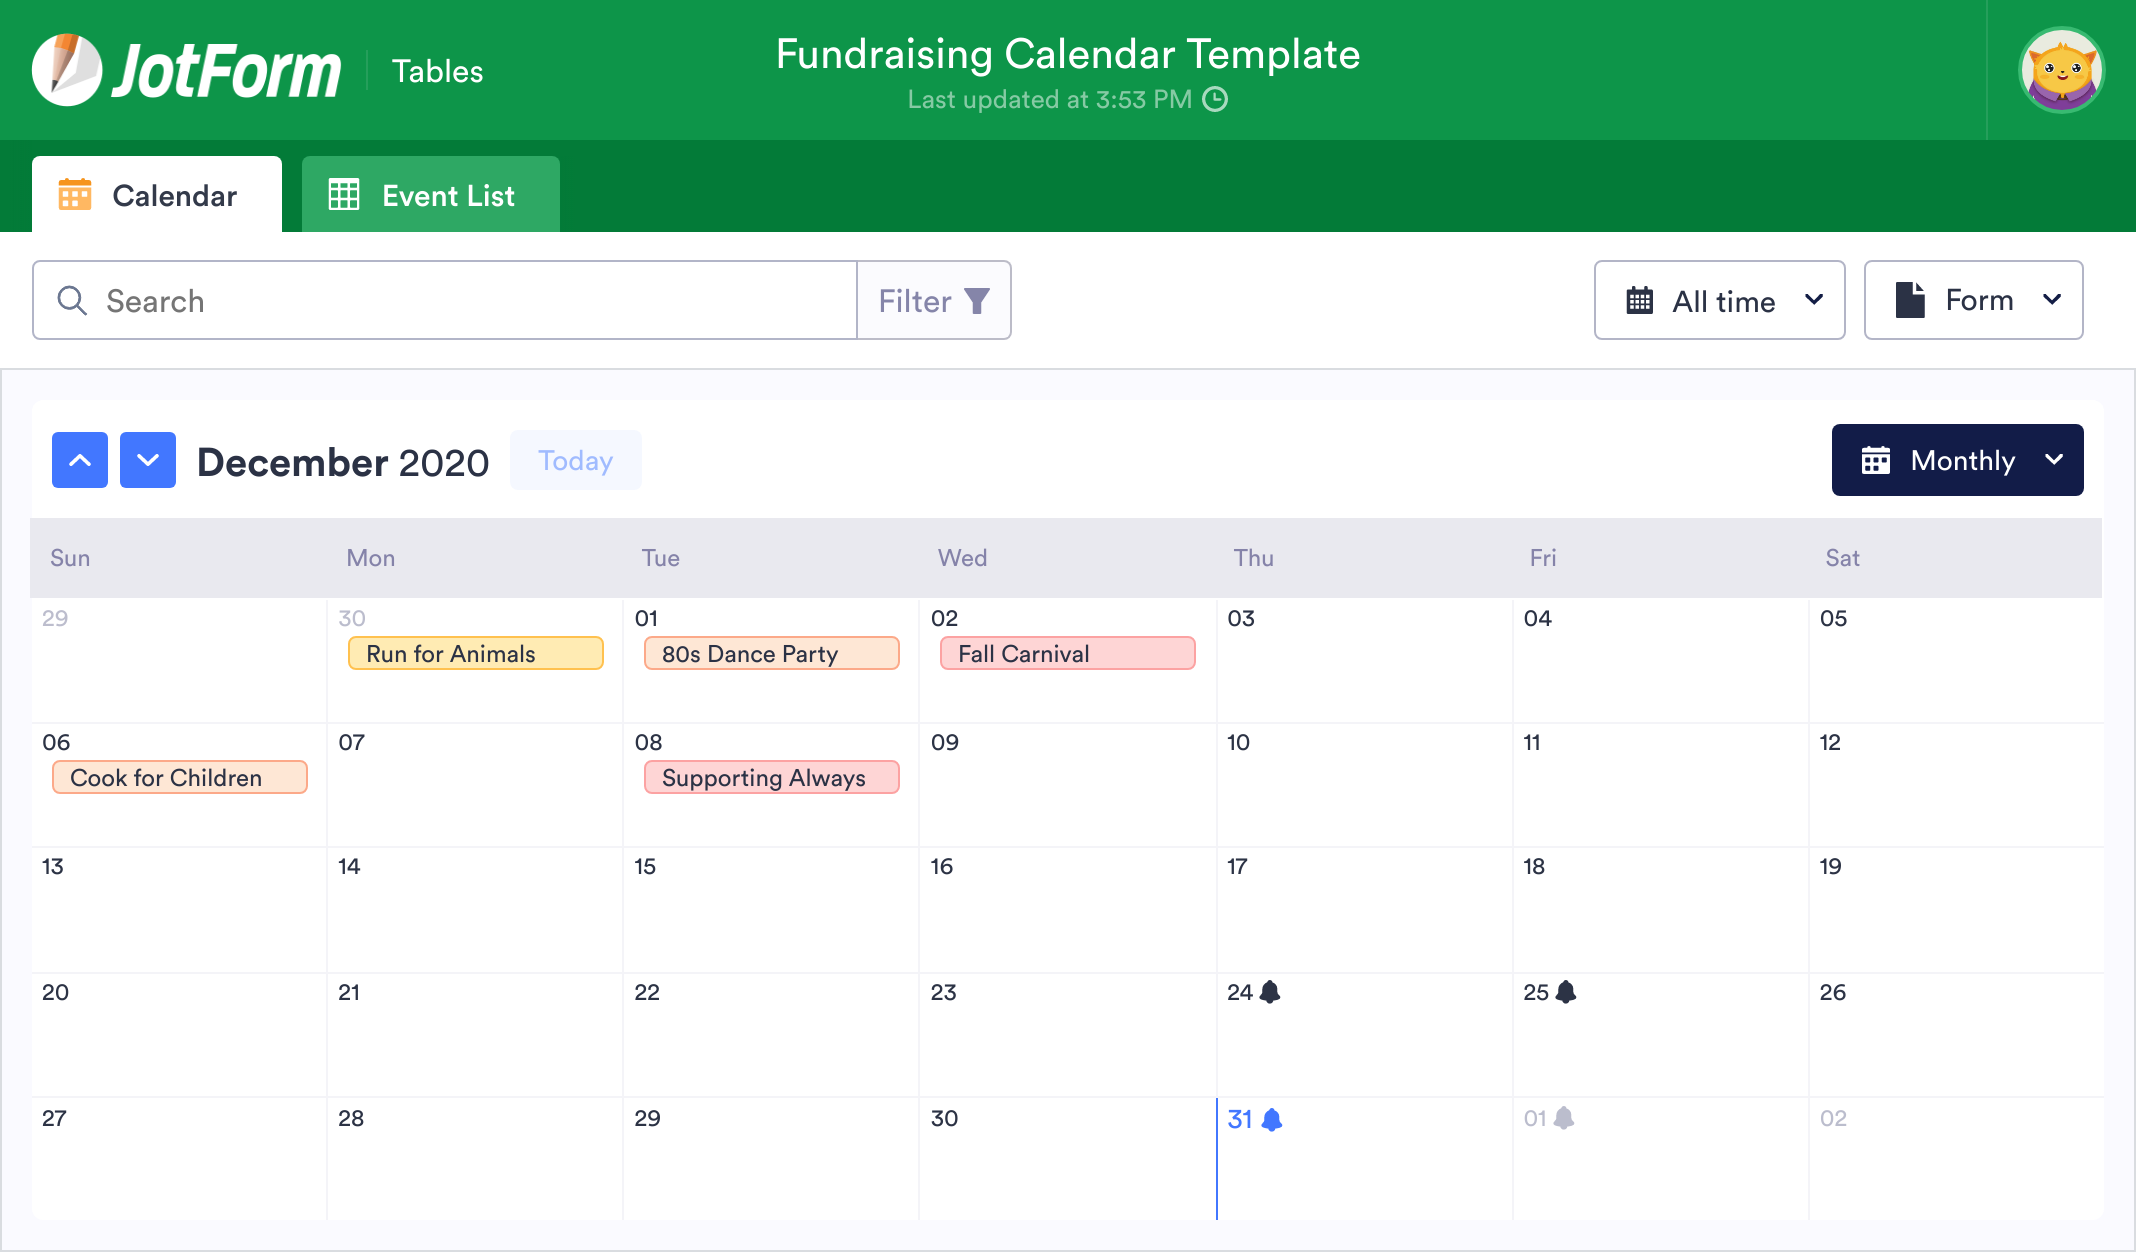 Fundraising Calendar Template